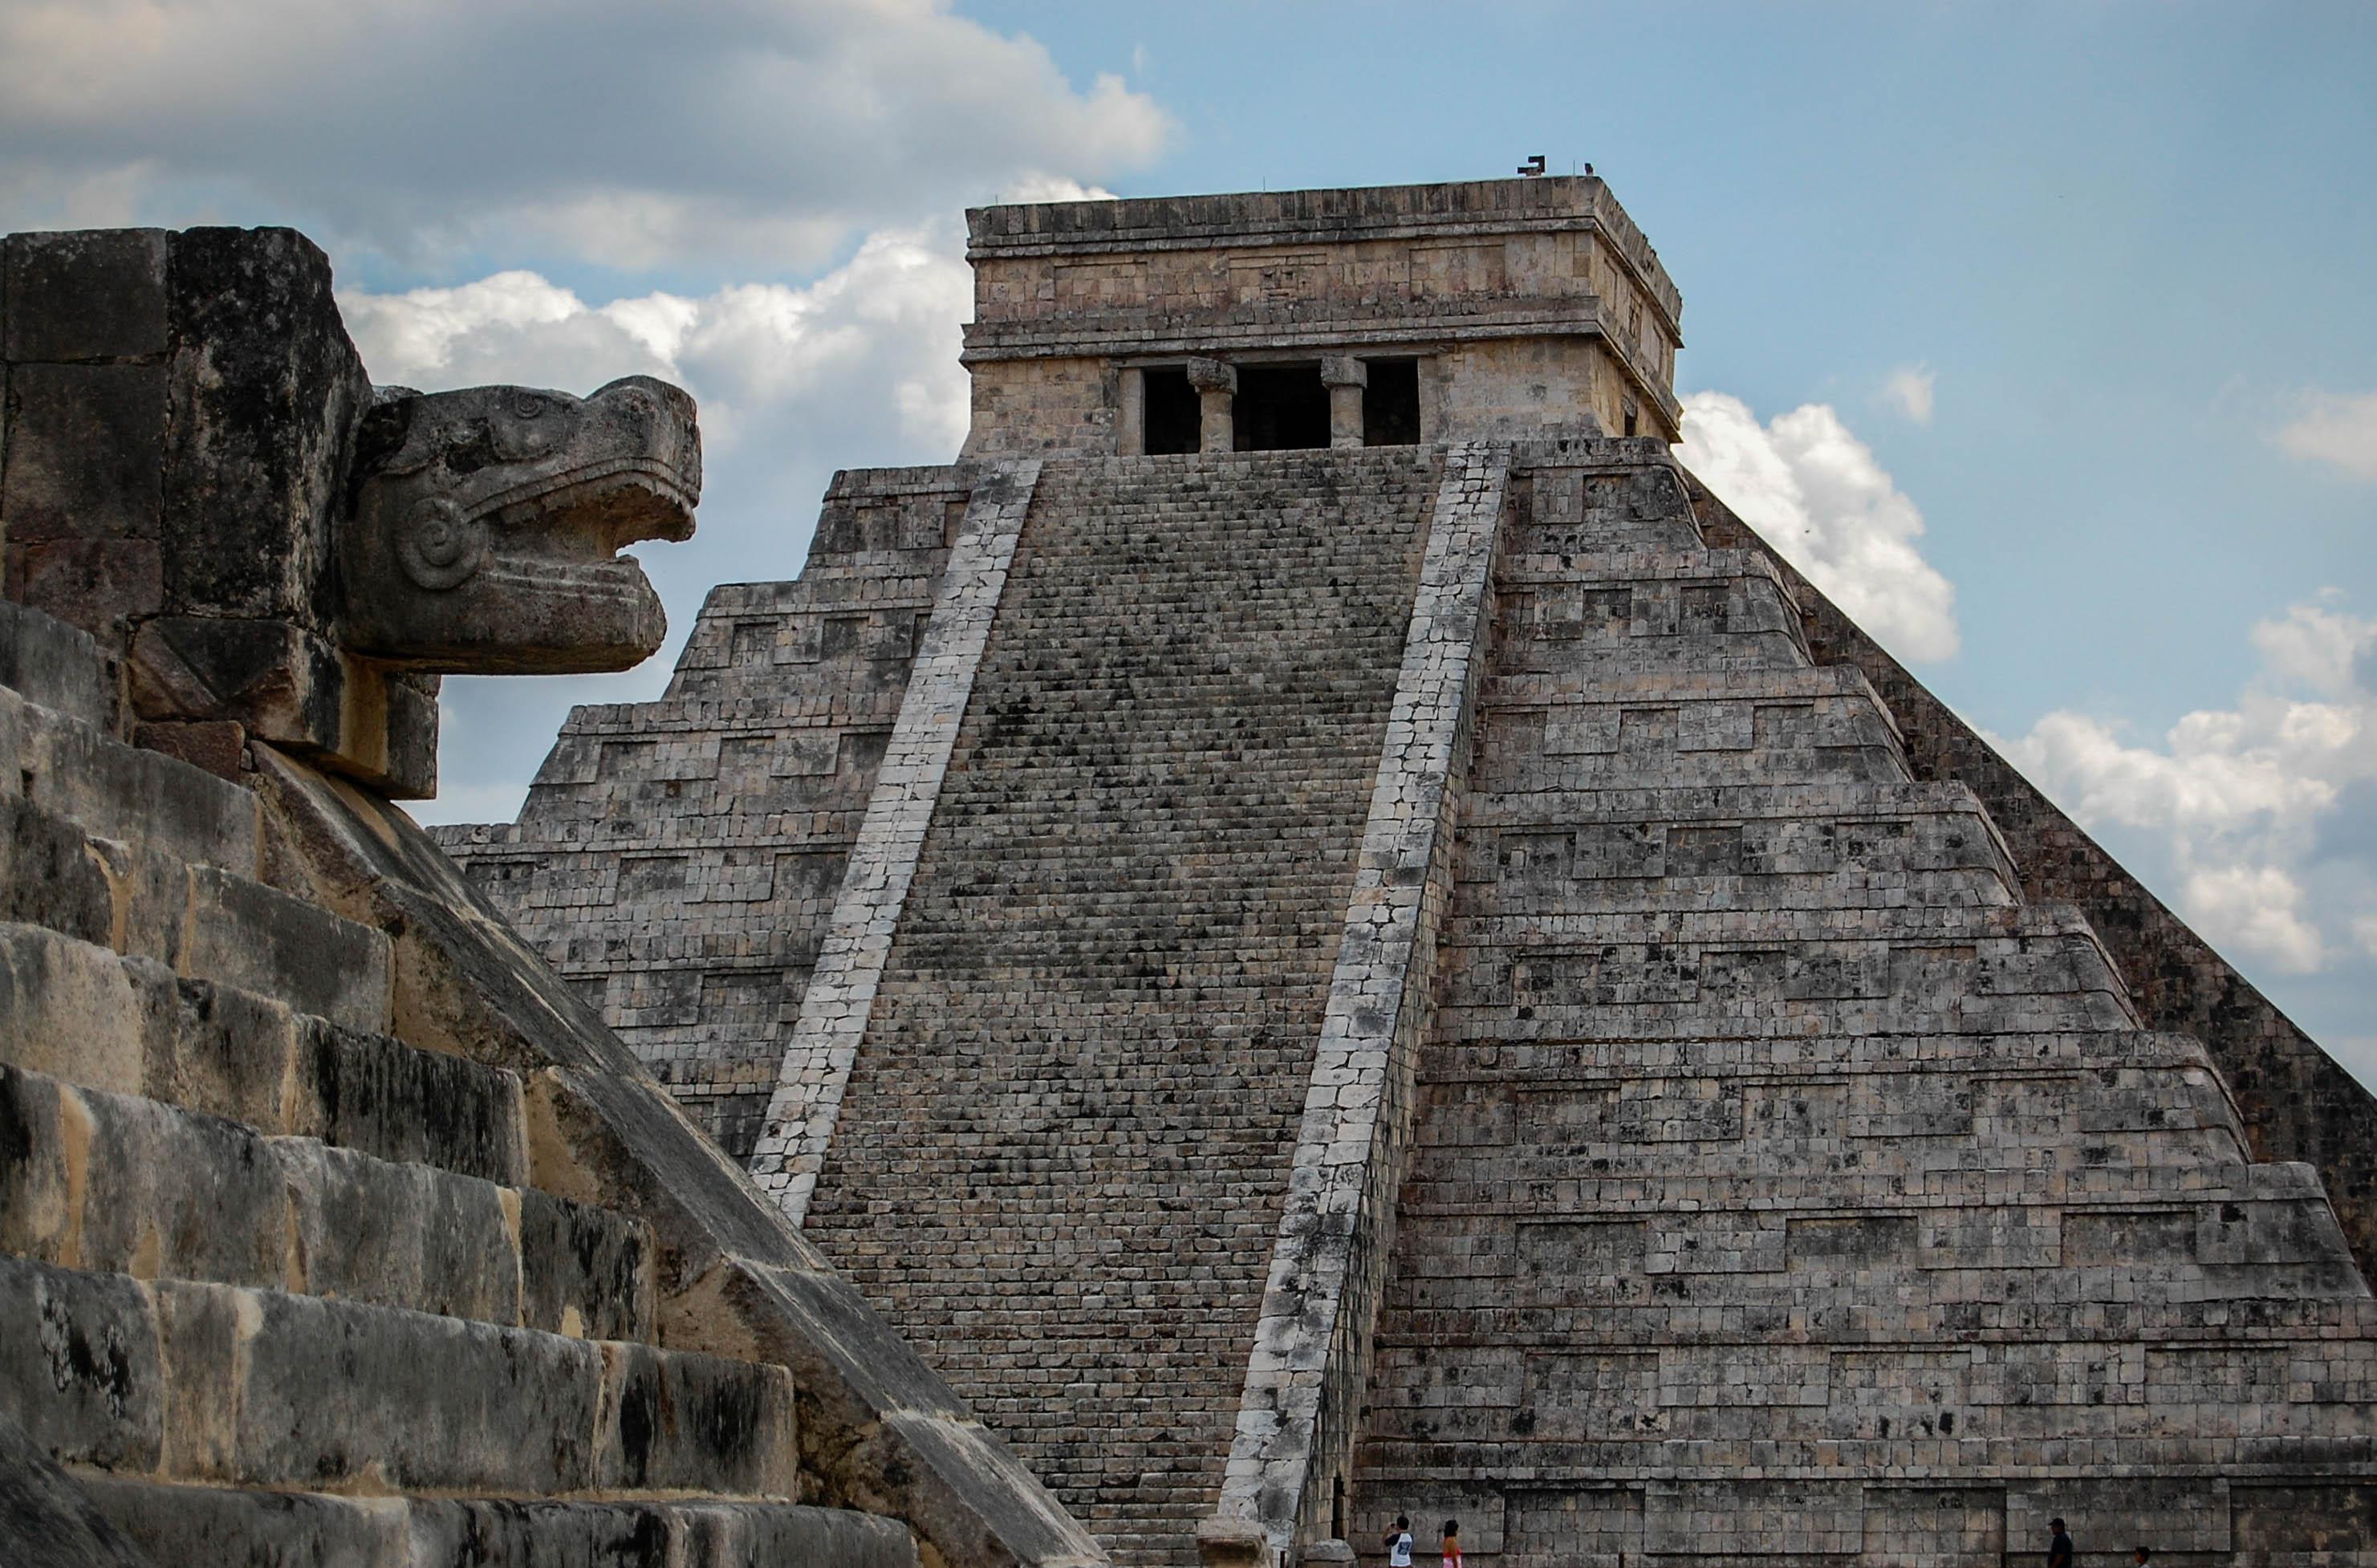 El-Castillo-4